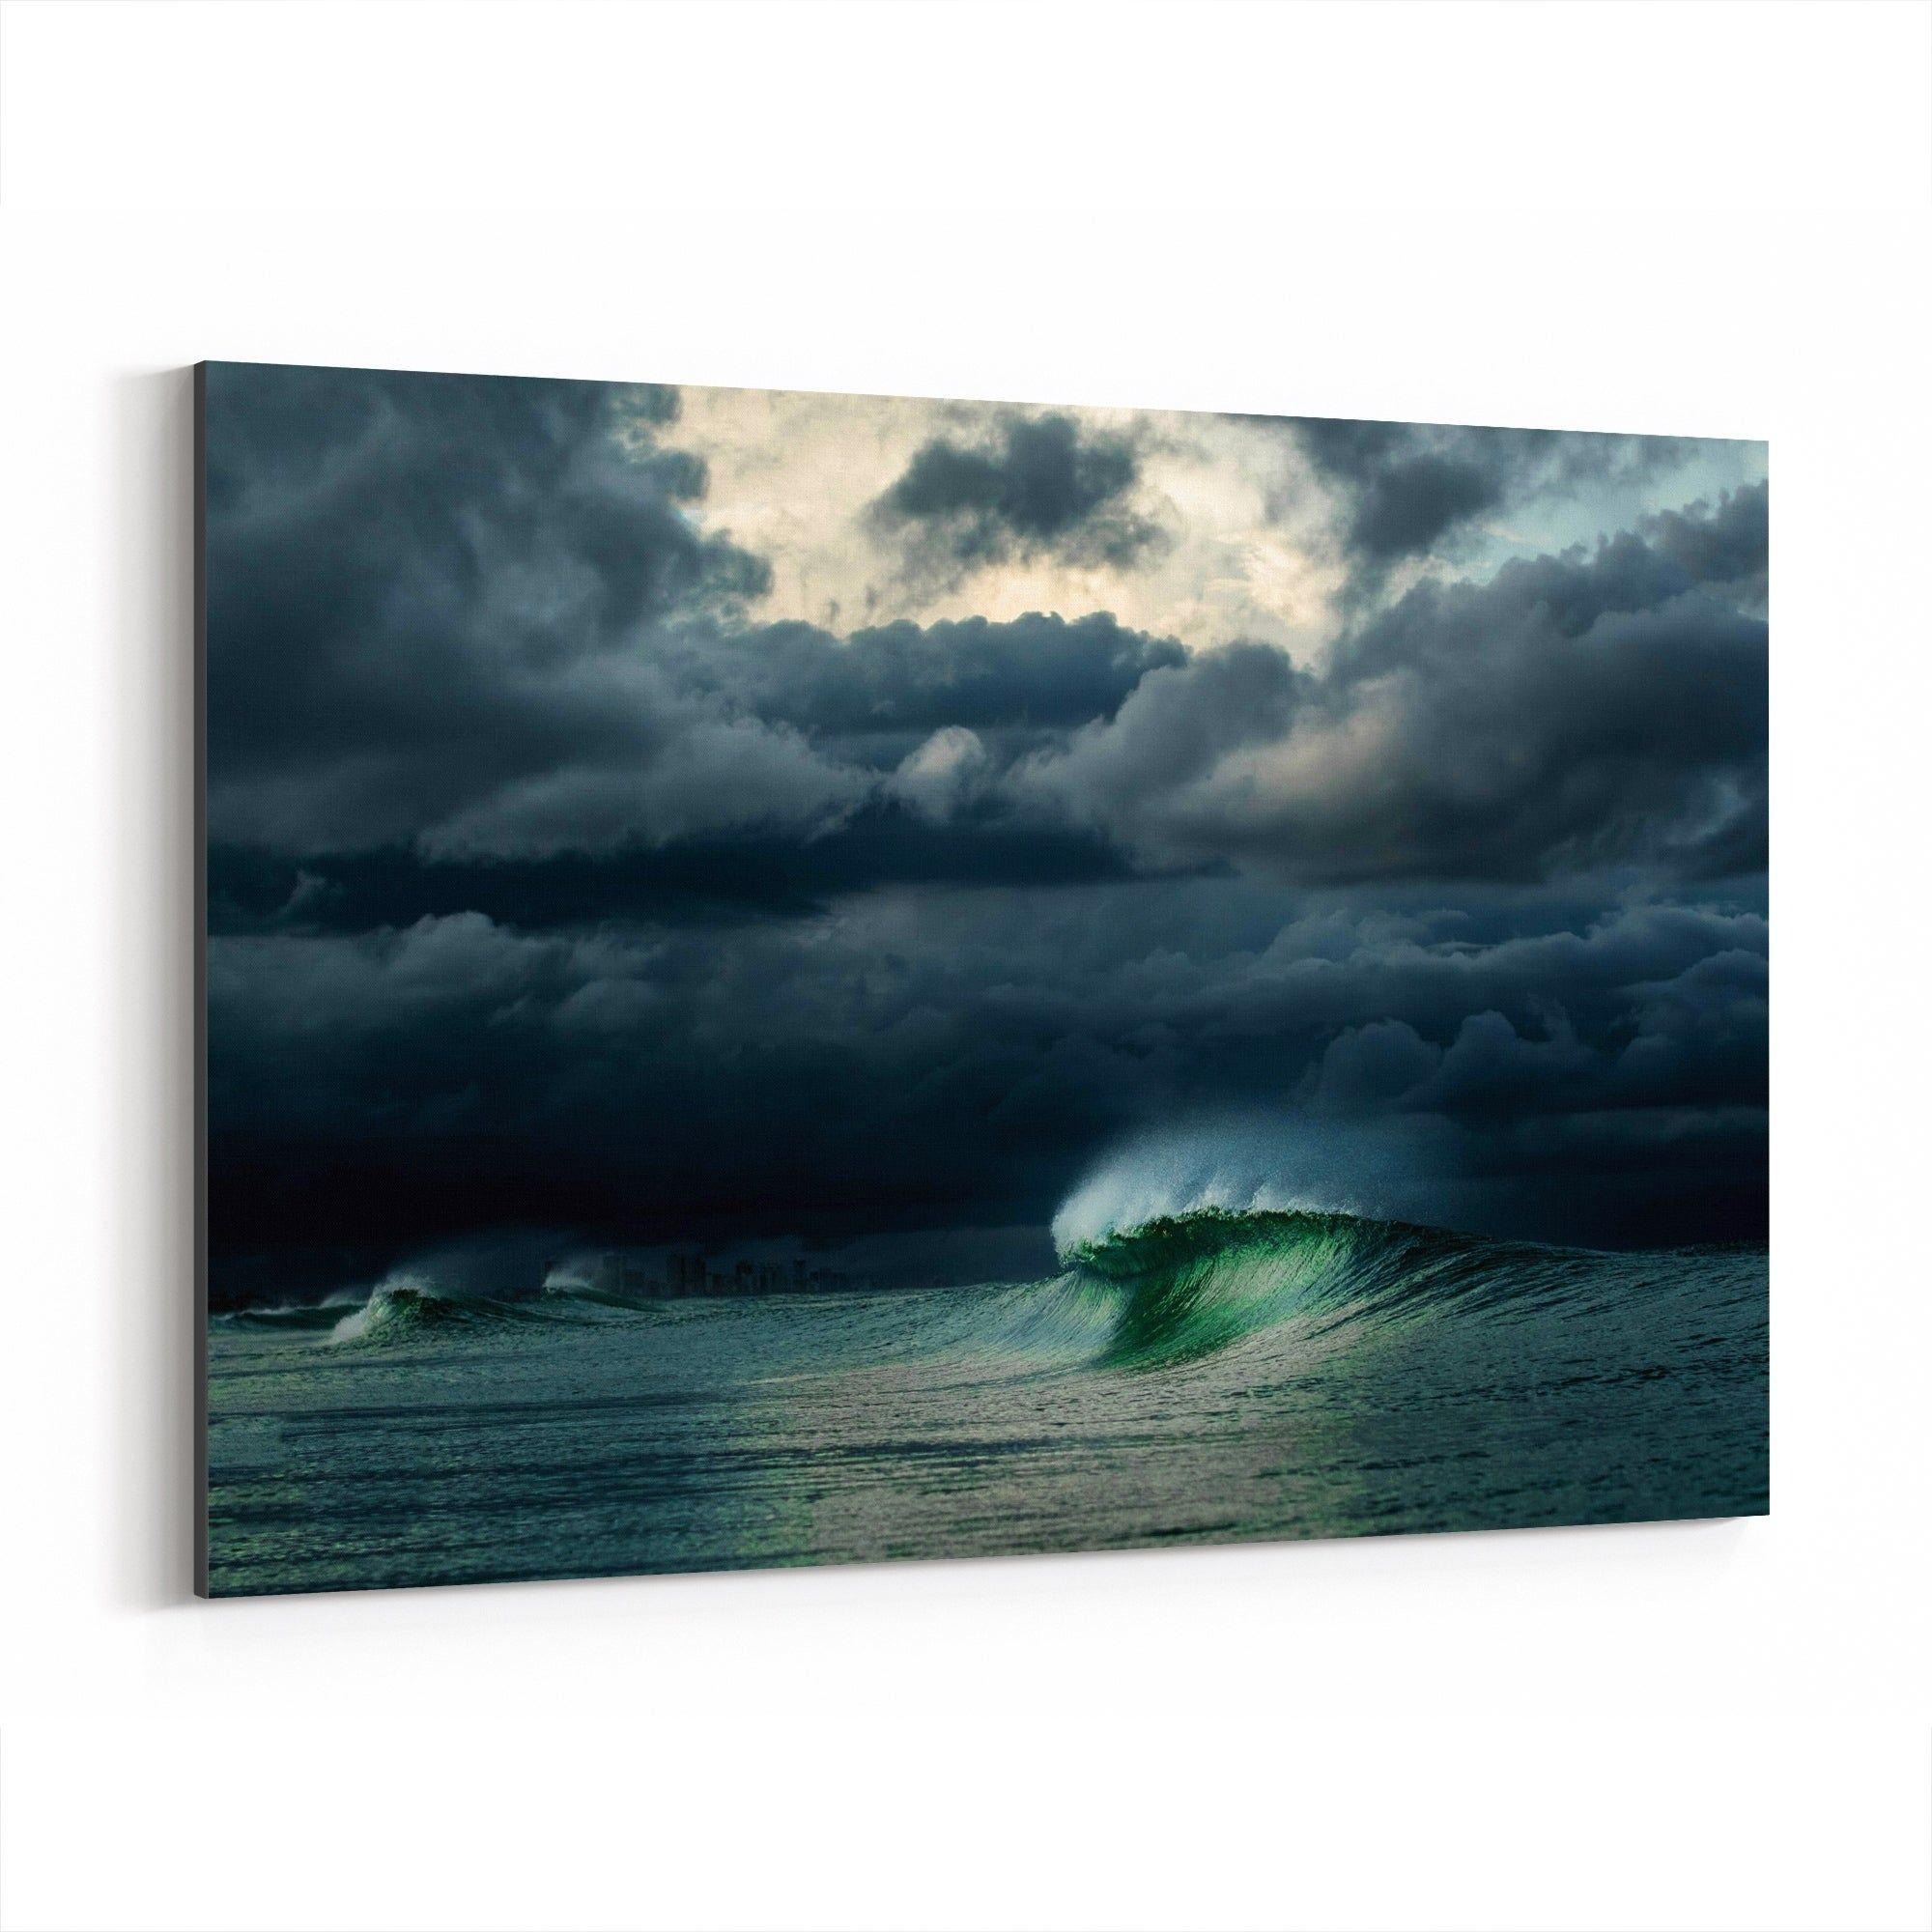 Noir Gallery Dramatic Storm Florida Daytona Beach Canvas Wall Art